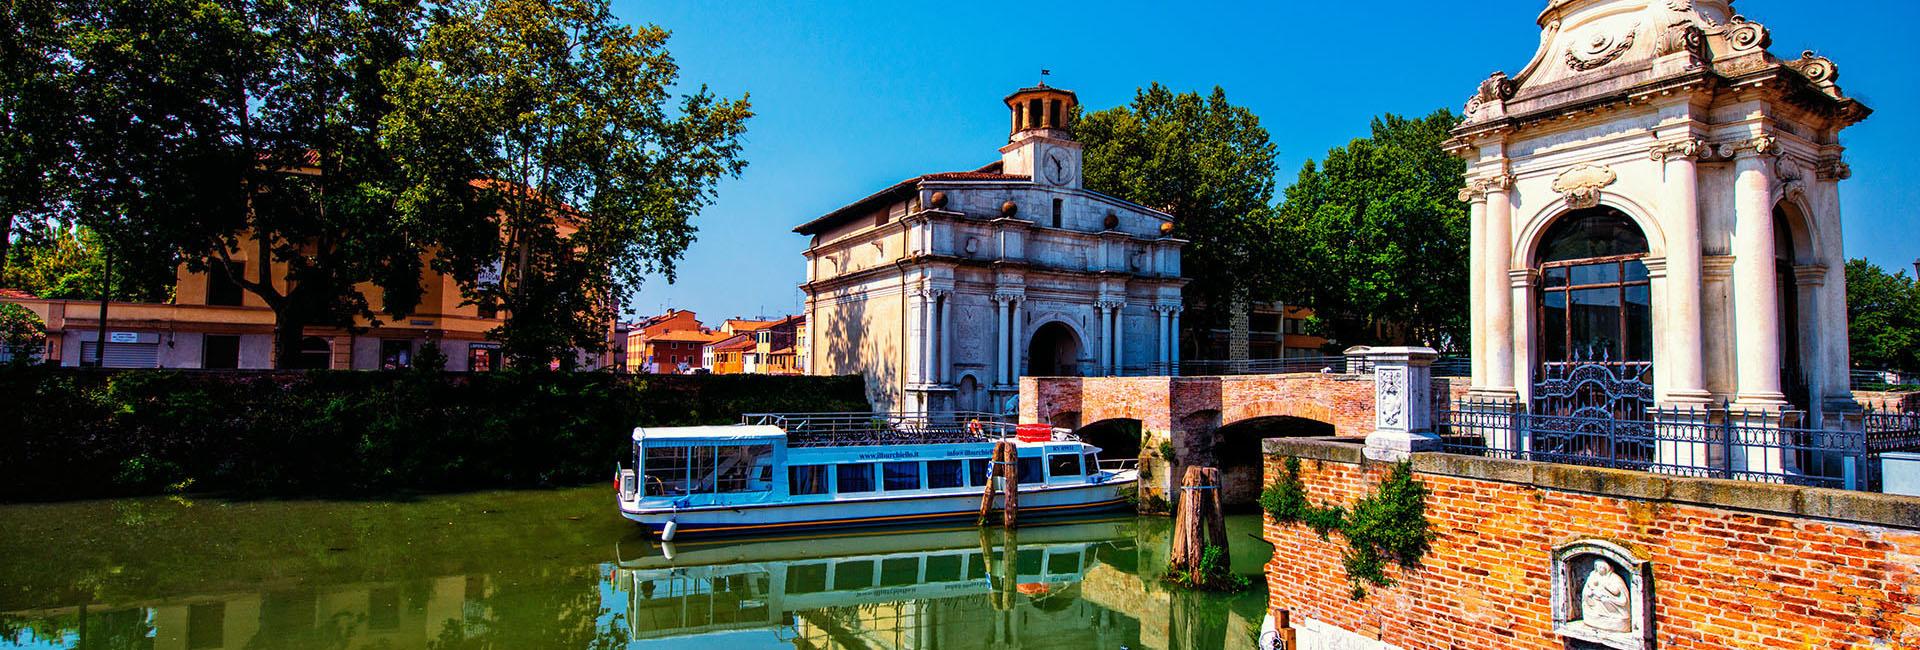 Padova Travel Vie d'acqua